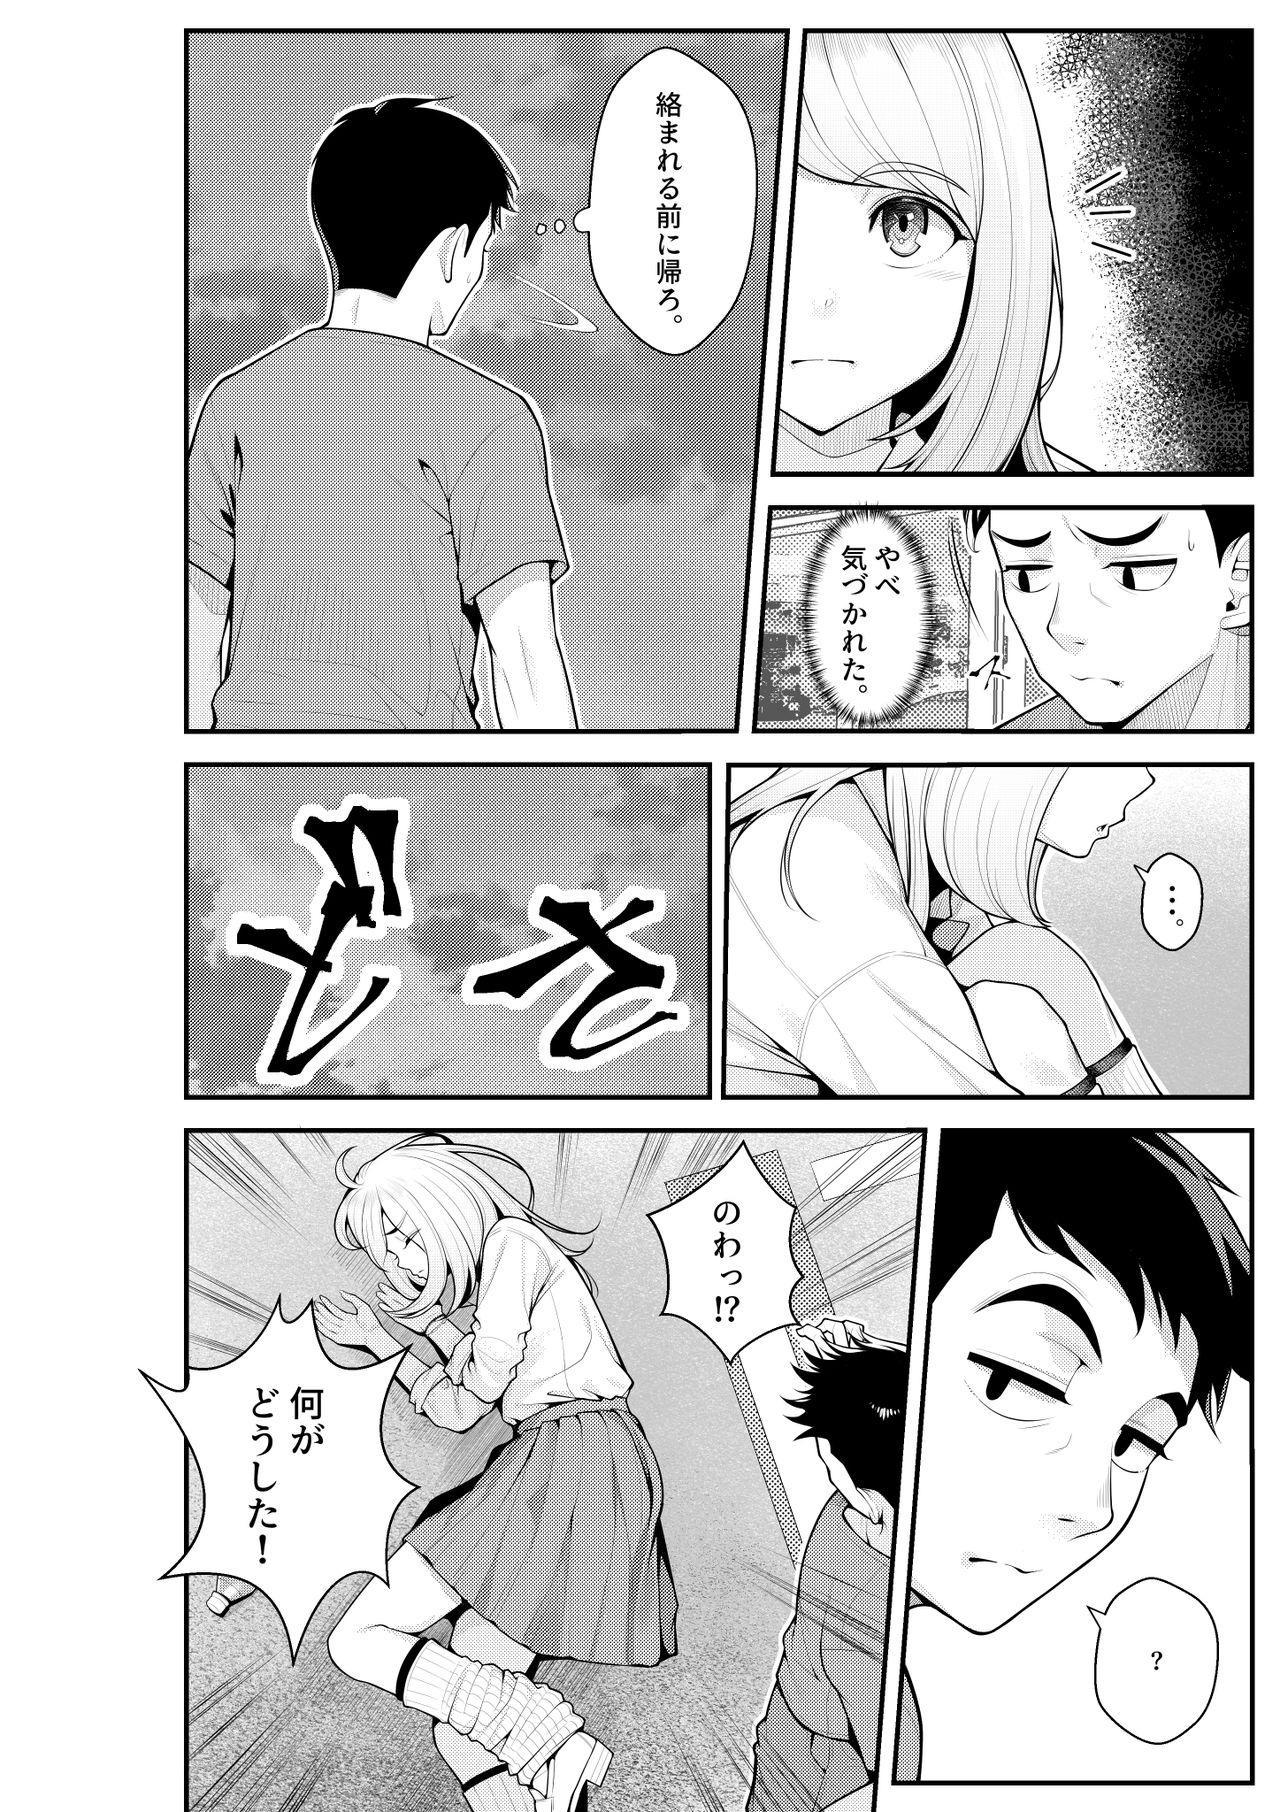 Iede Gal o Hirottara Harem ni Natta Hanashi 5